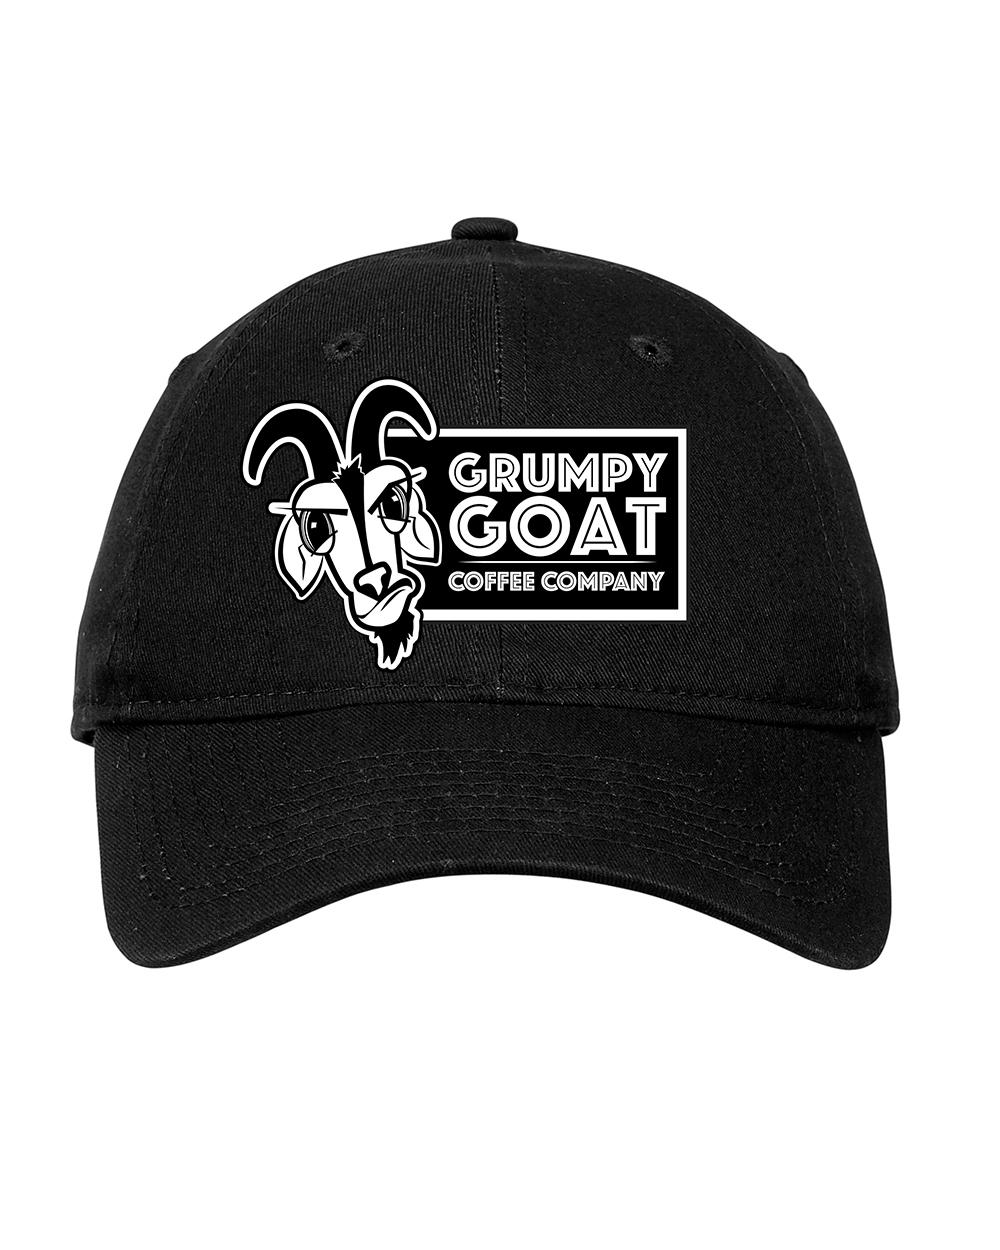 Grumpy Goat New Era® - Adjustable Unstructured Cap